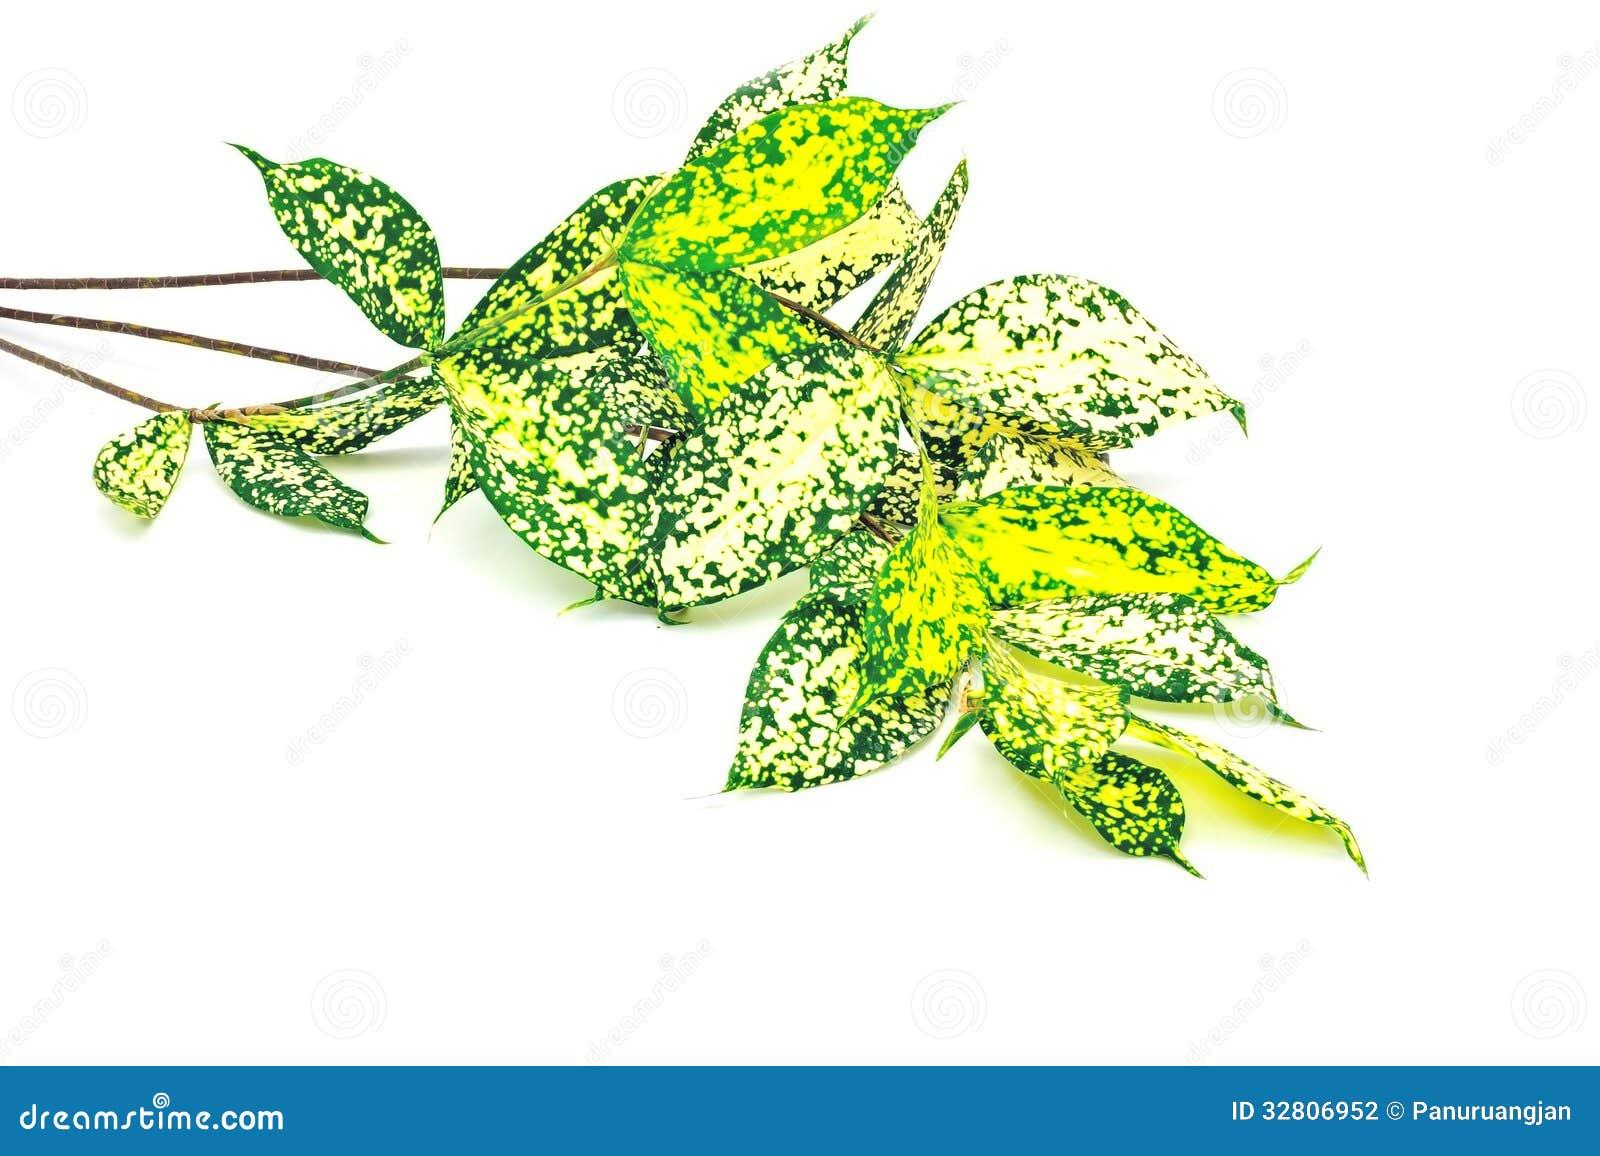 Foliage leaves of dracaena Gold dust dracaena or Spotted dracaena  #AEBB10